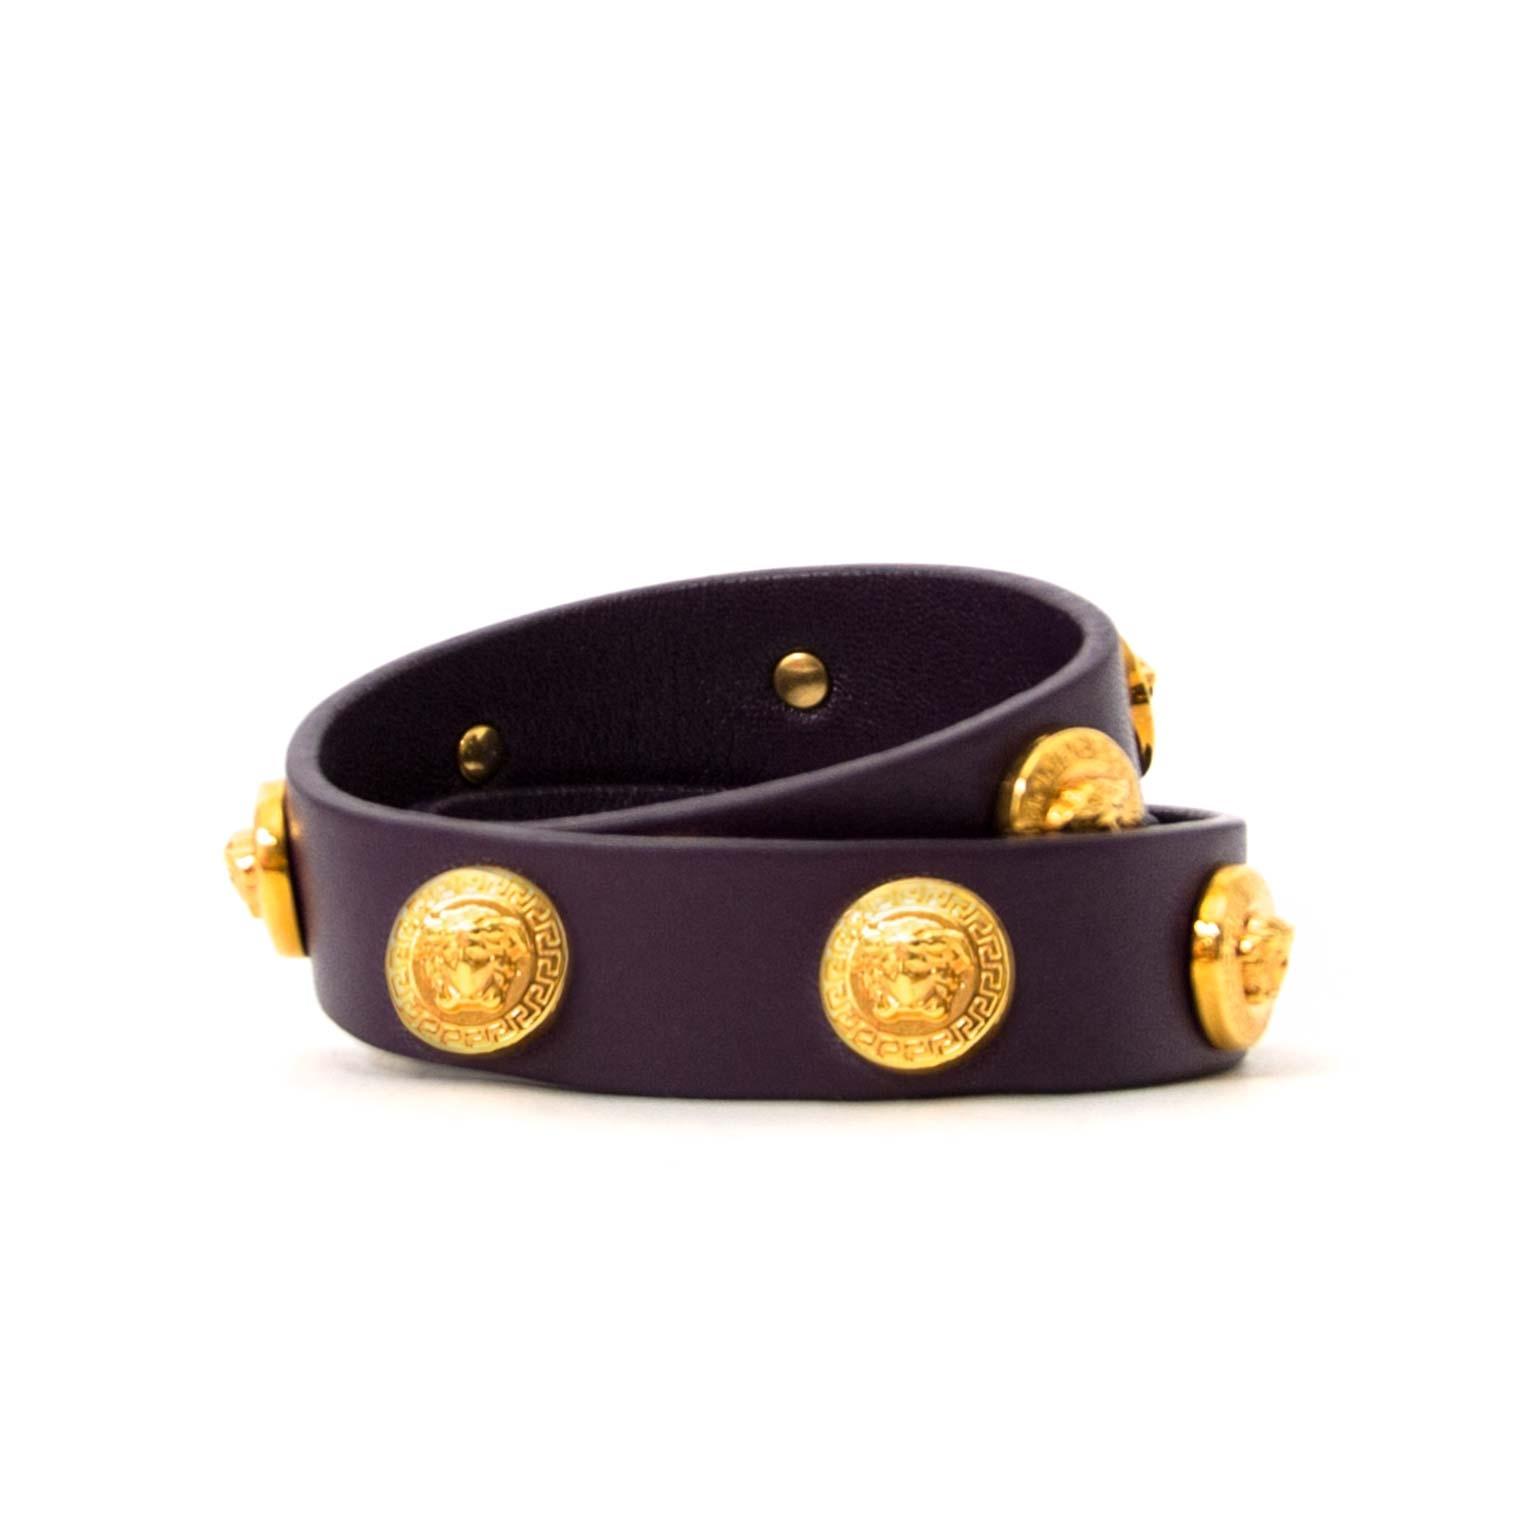 koop authentieke versace wrap armband bij labellov vintage mode webshop belgië